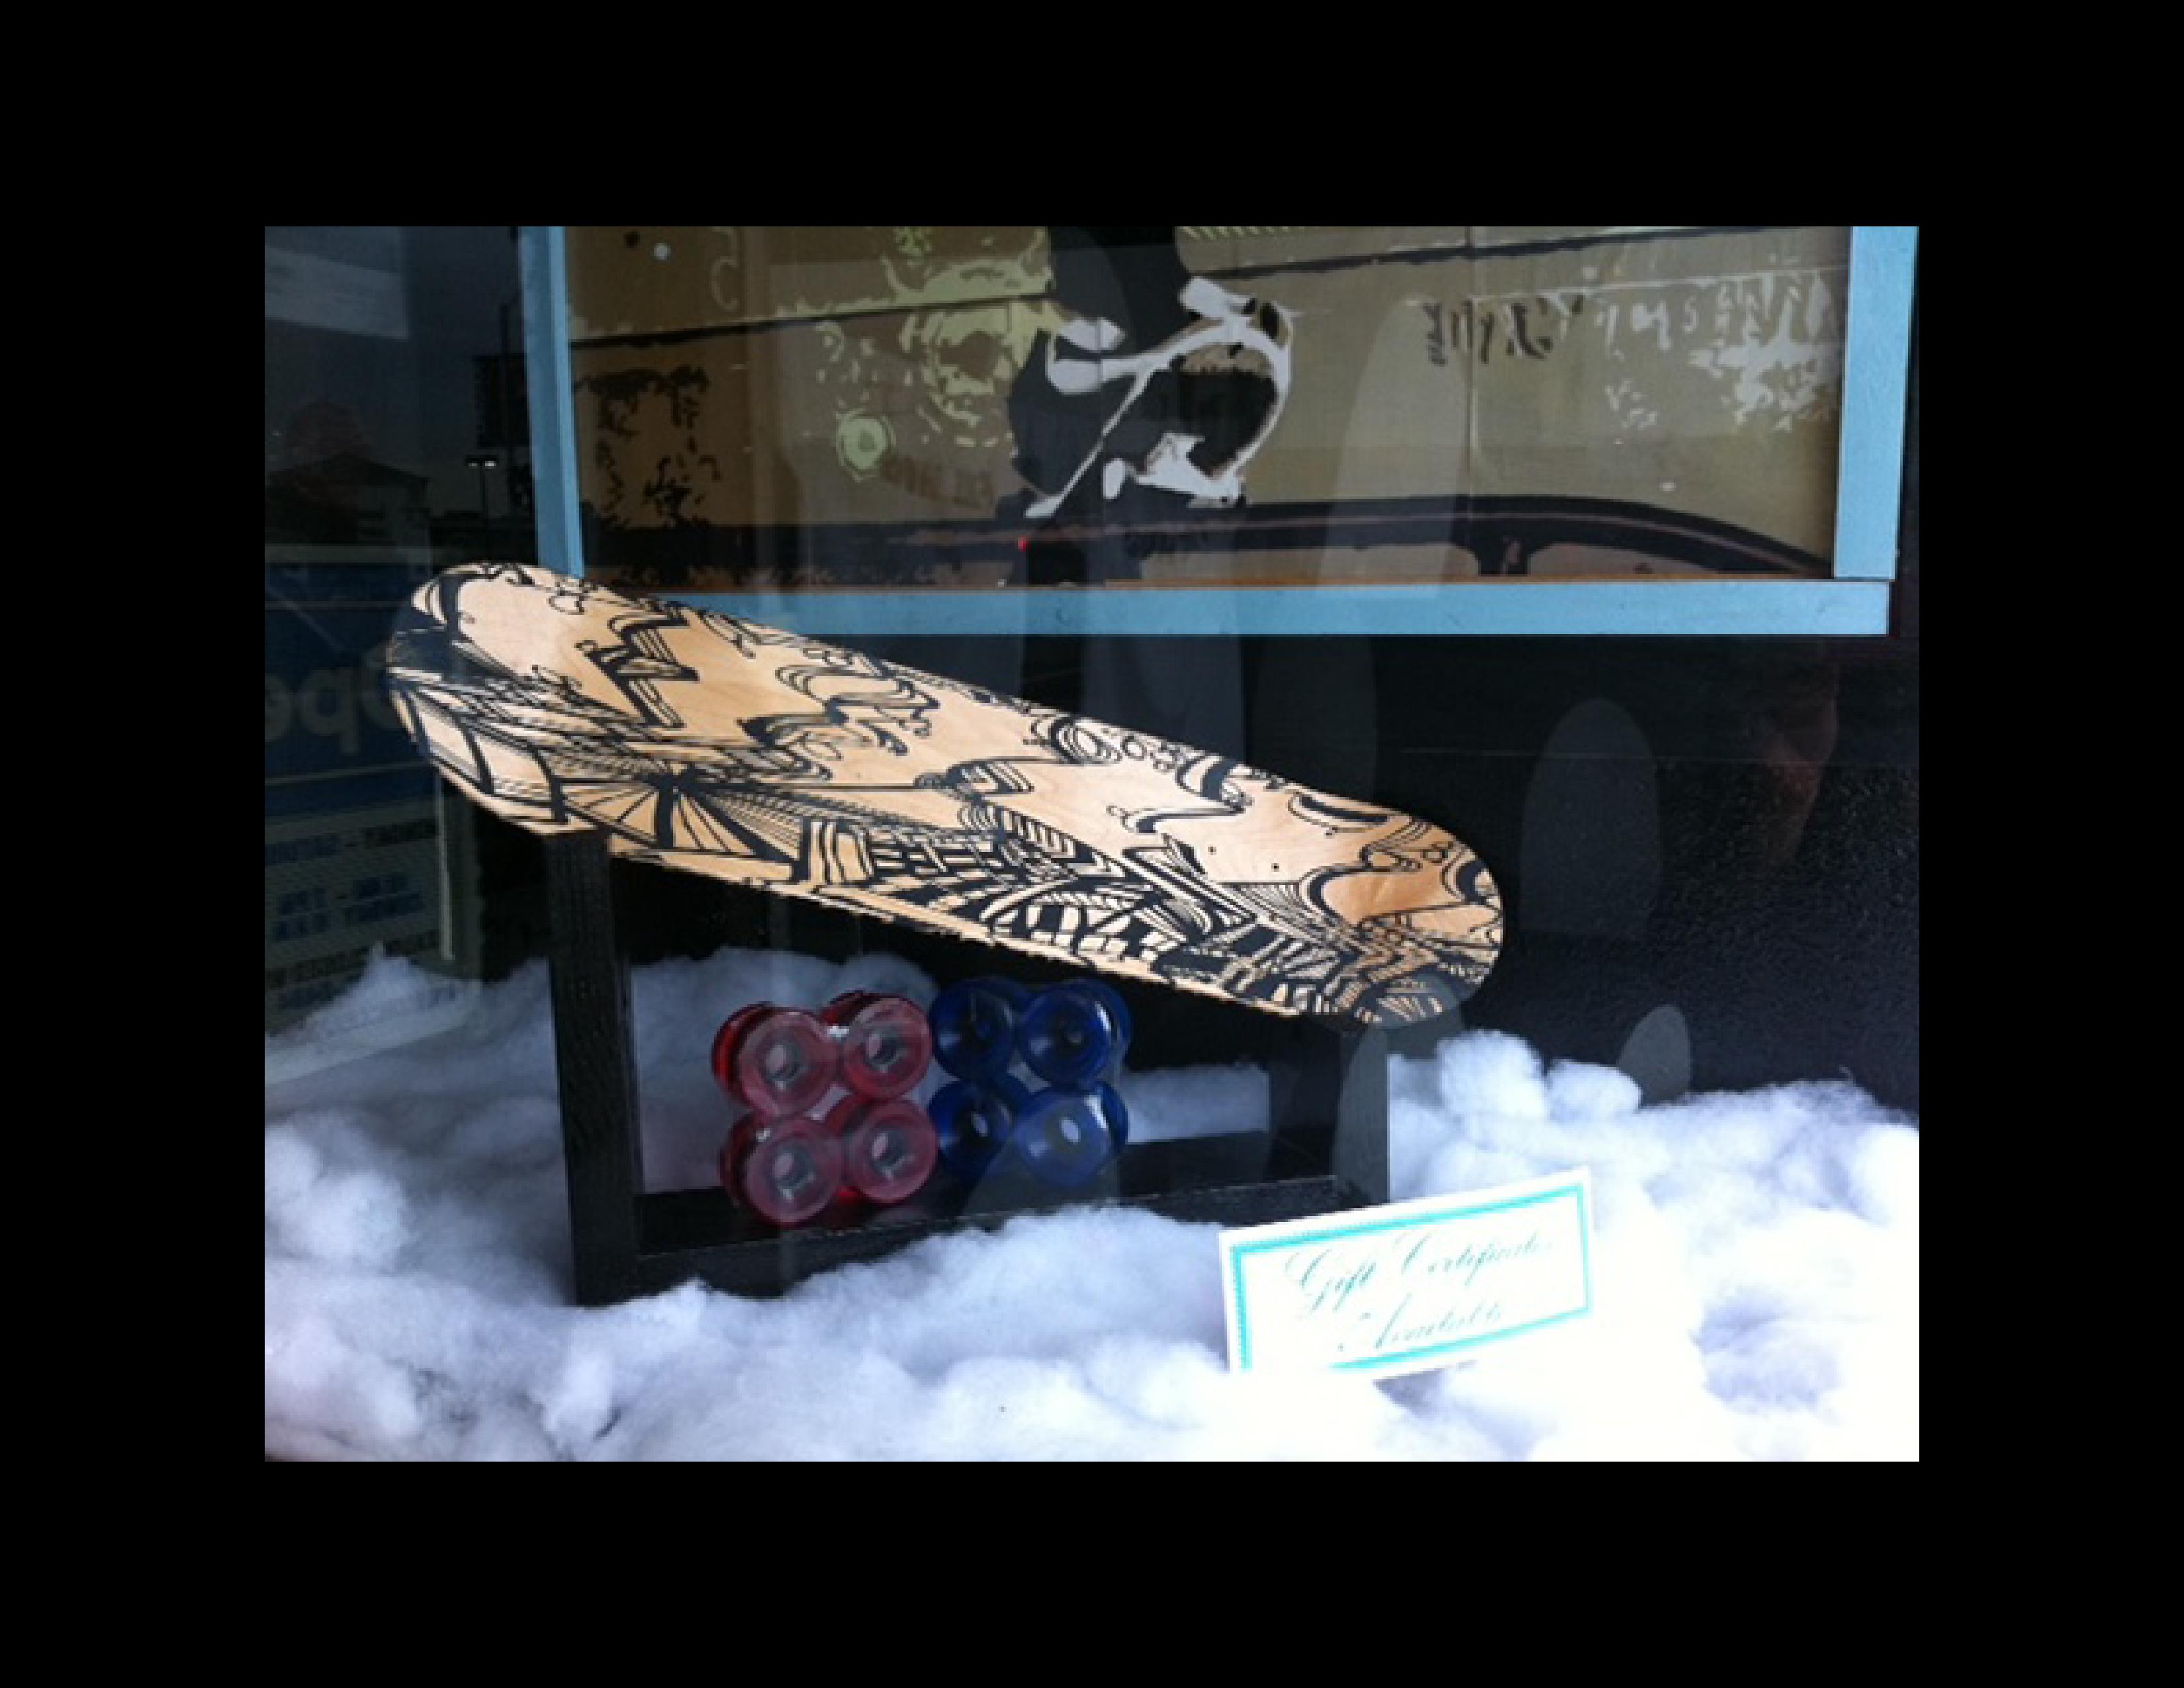 Sling Skate Deck